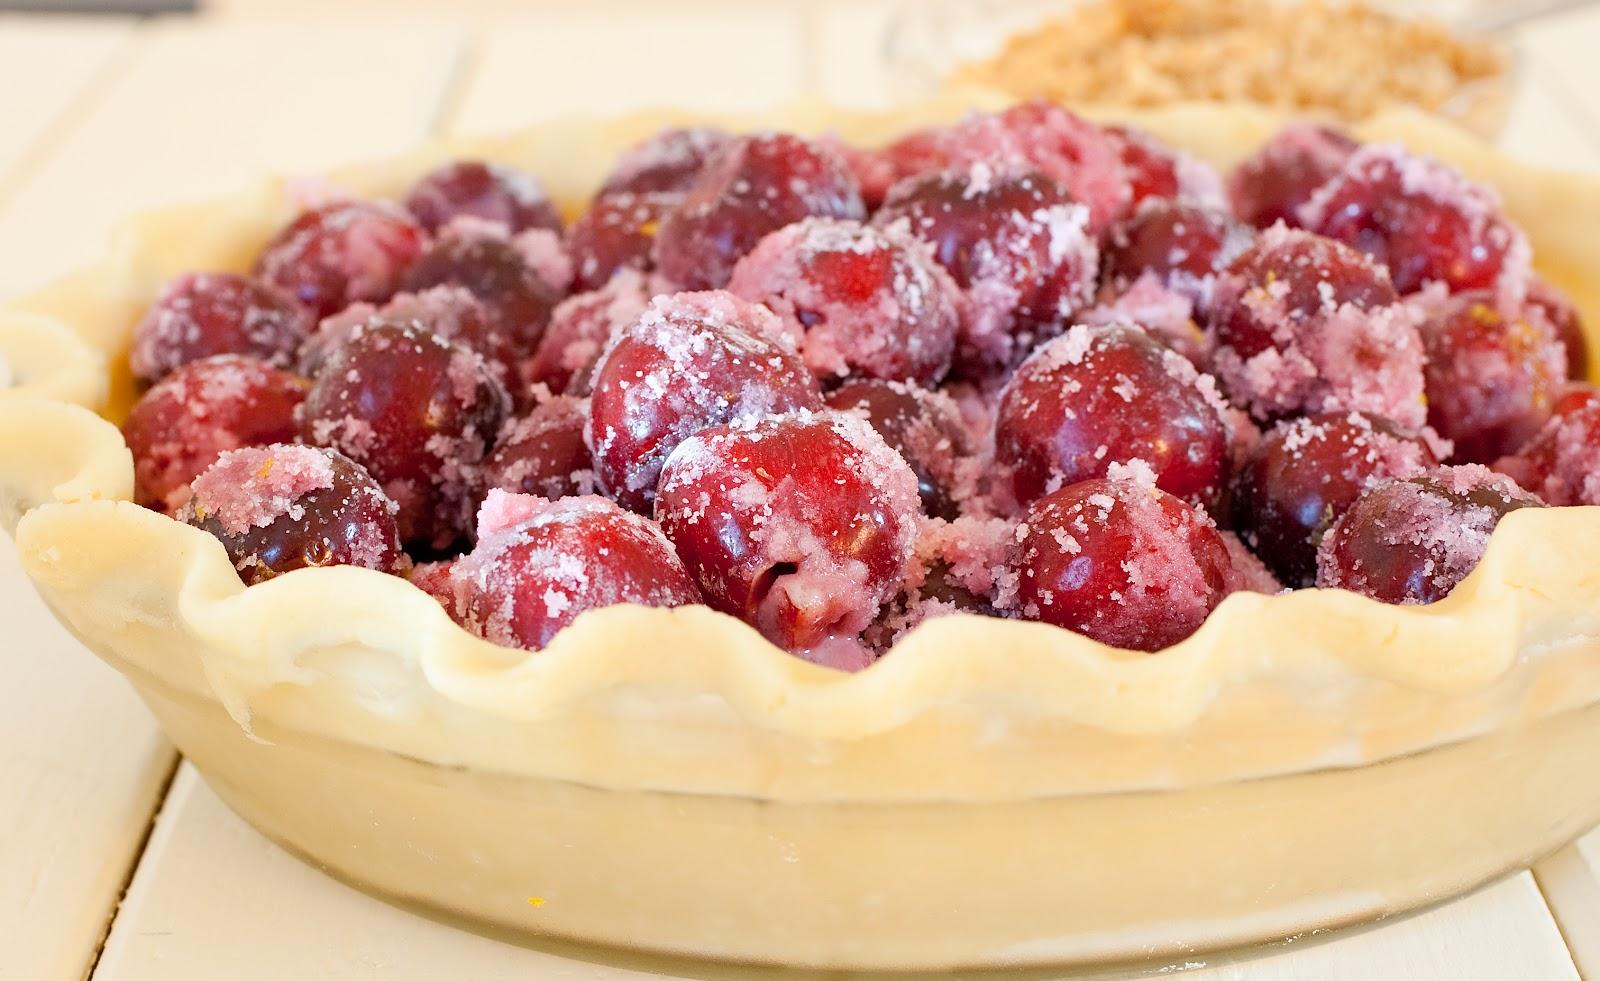 Tish Boyle Sweet Dreams: Fresh Cherry Crumble Pie